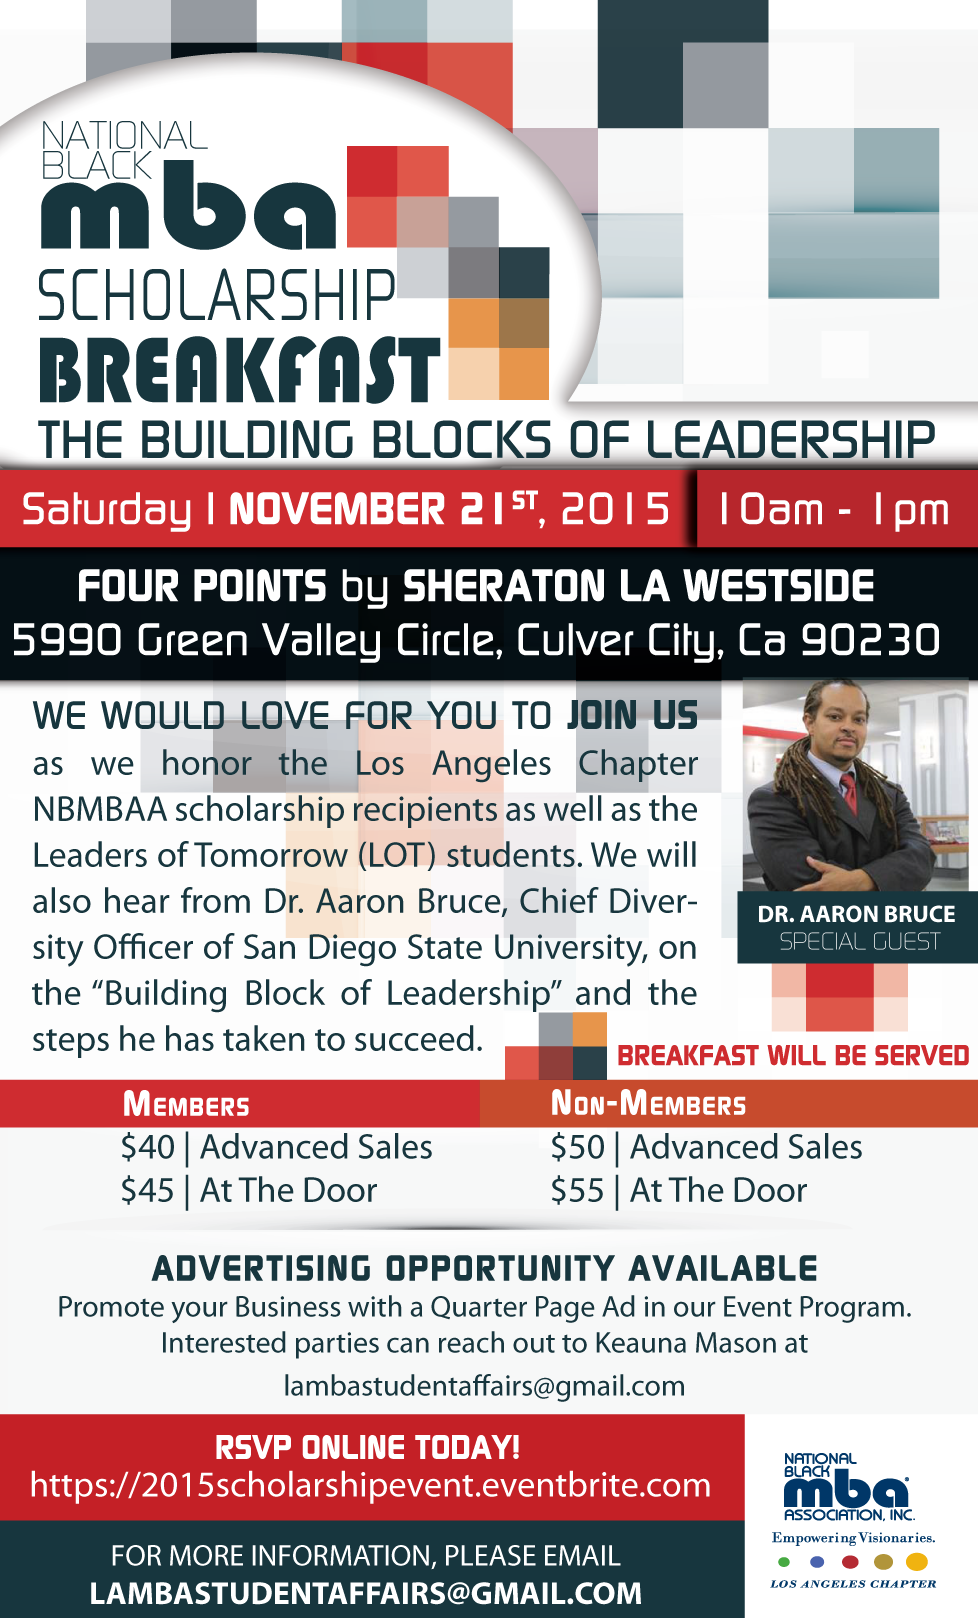 2015 Scholarship Breakfast Flyer